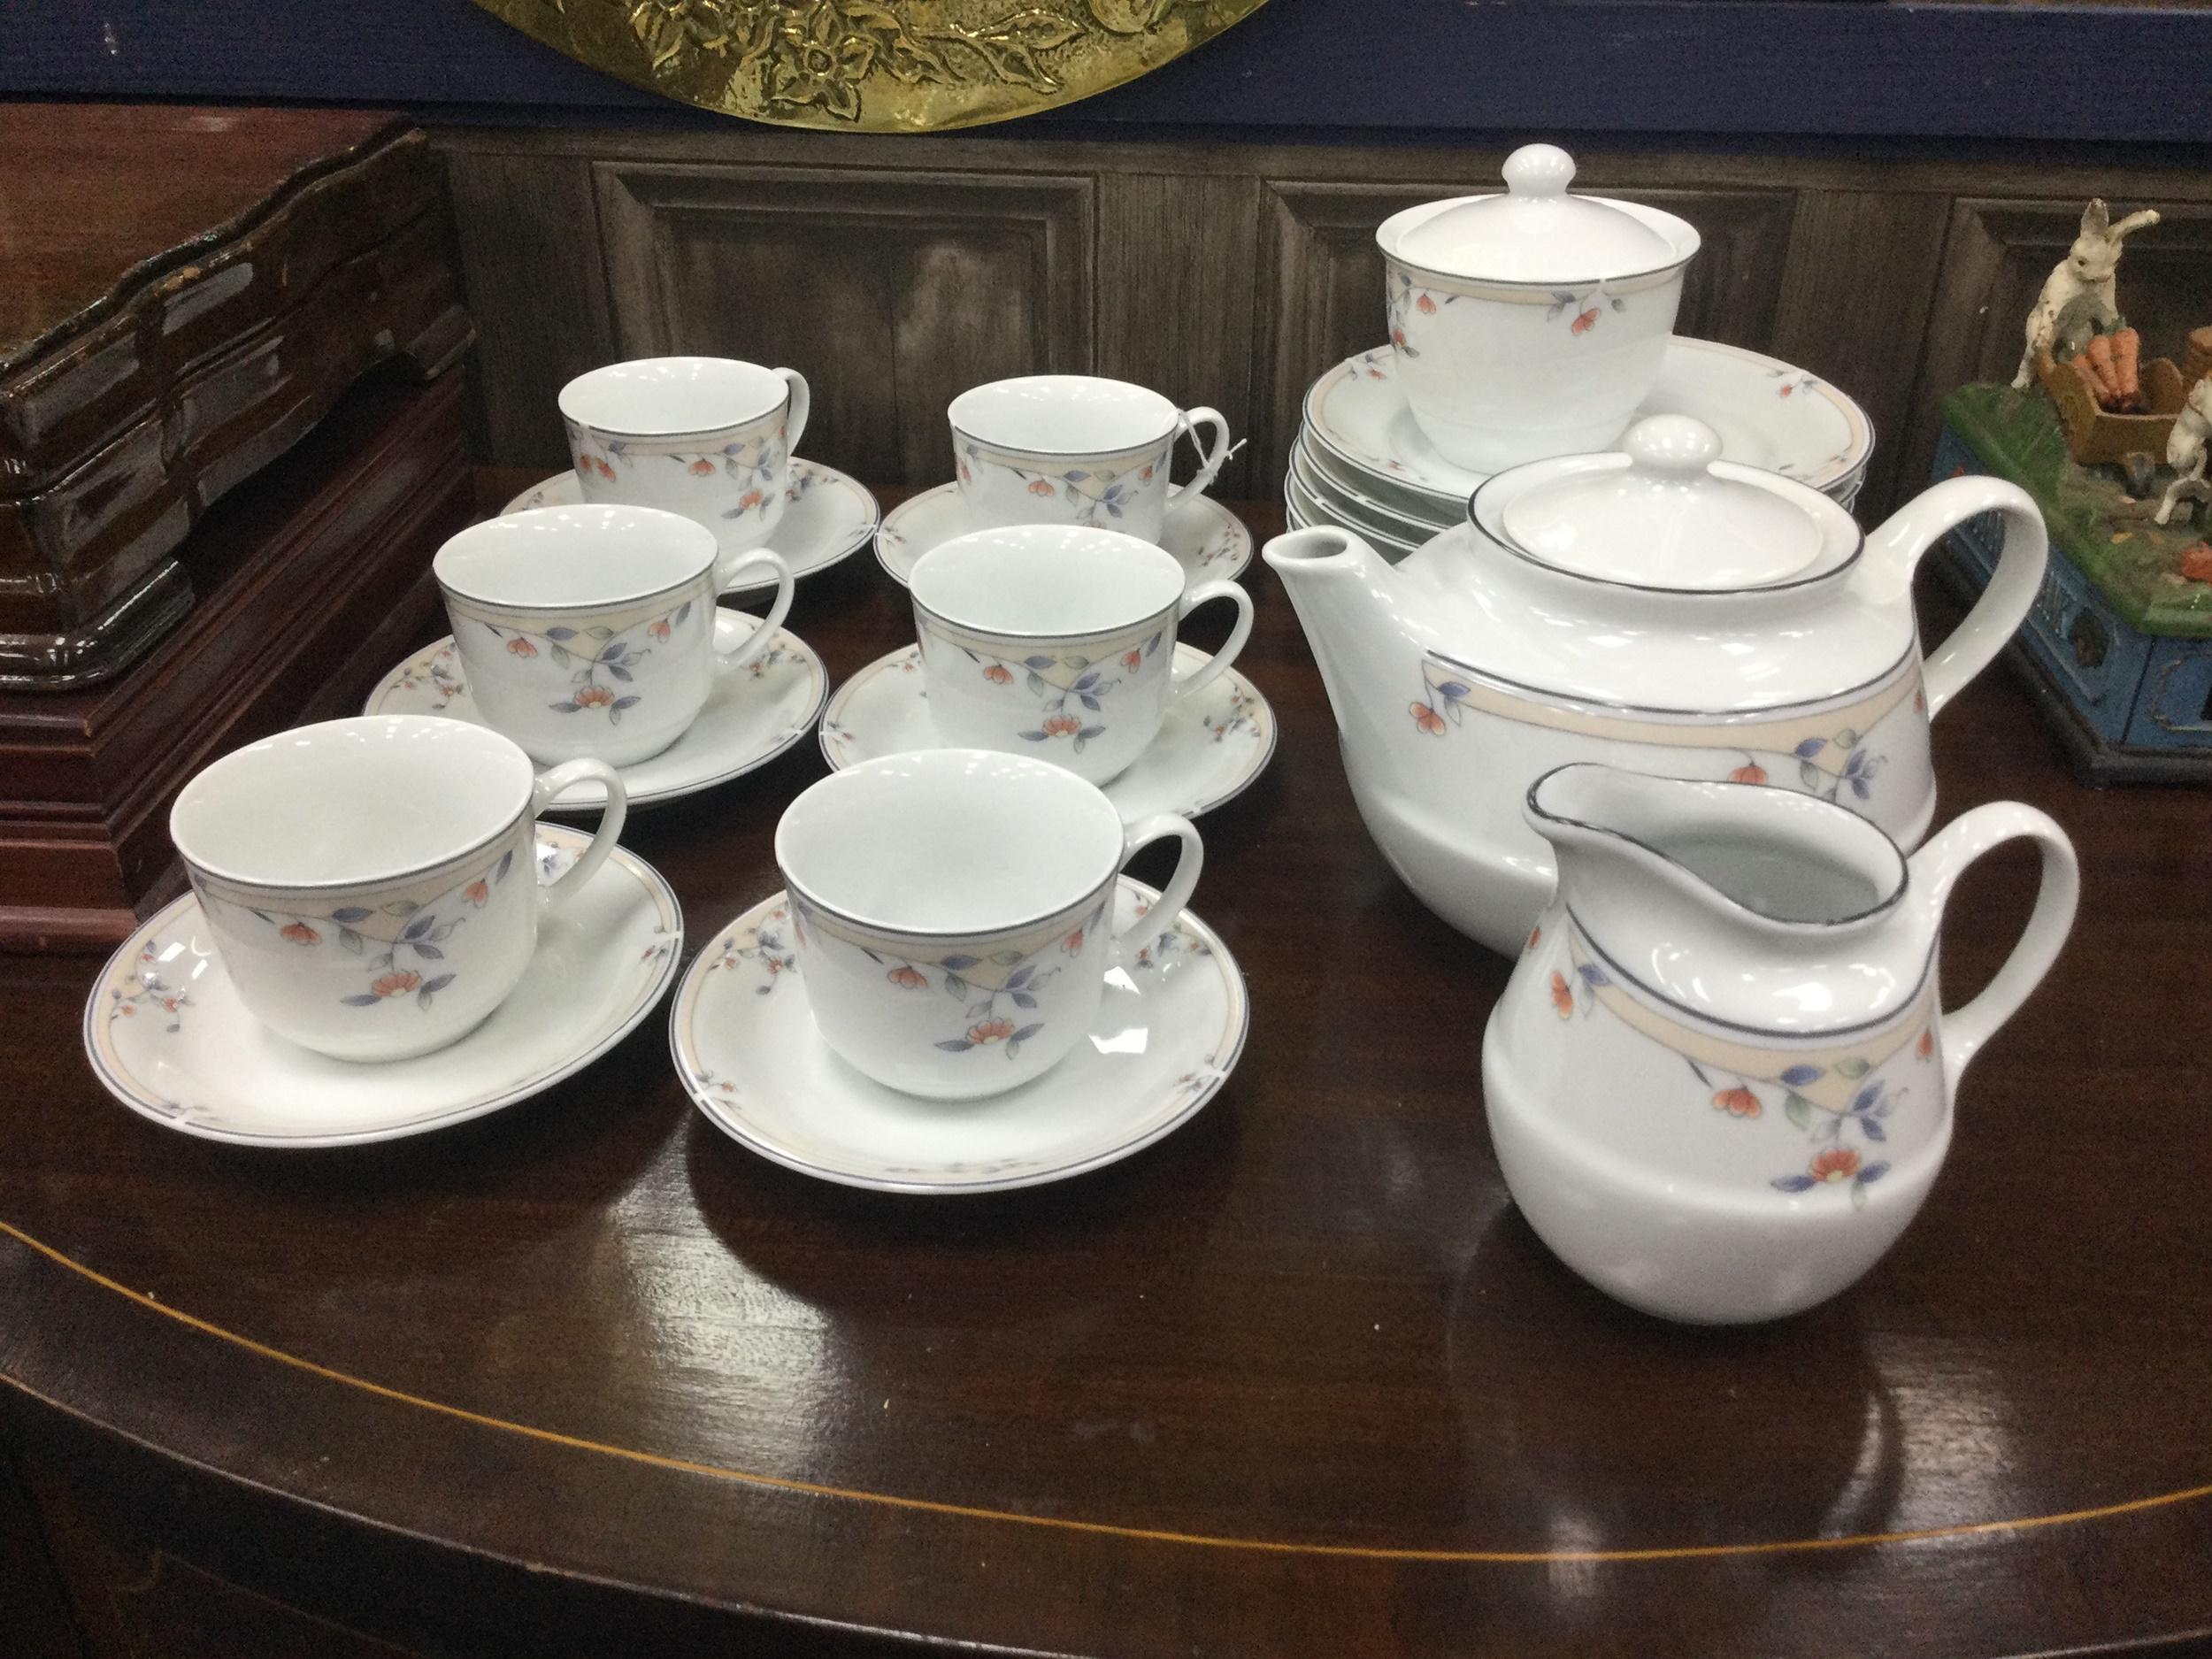 A PRINCESS HOUSE 'MELODY' PATTERN TEA SERVICE